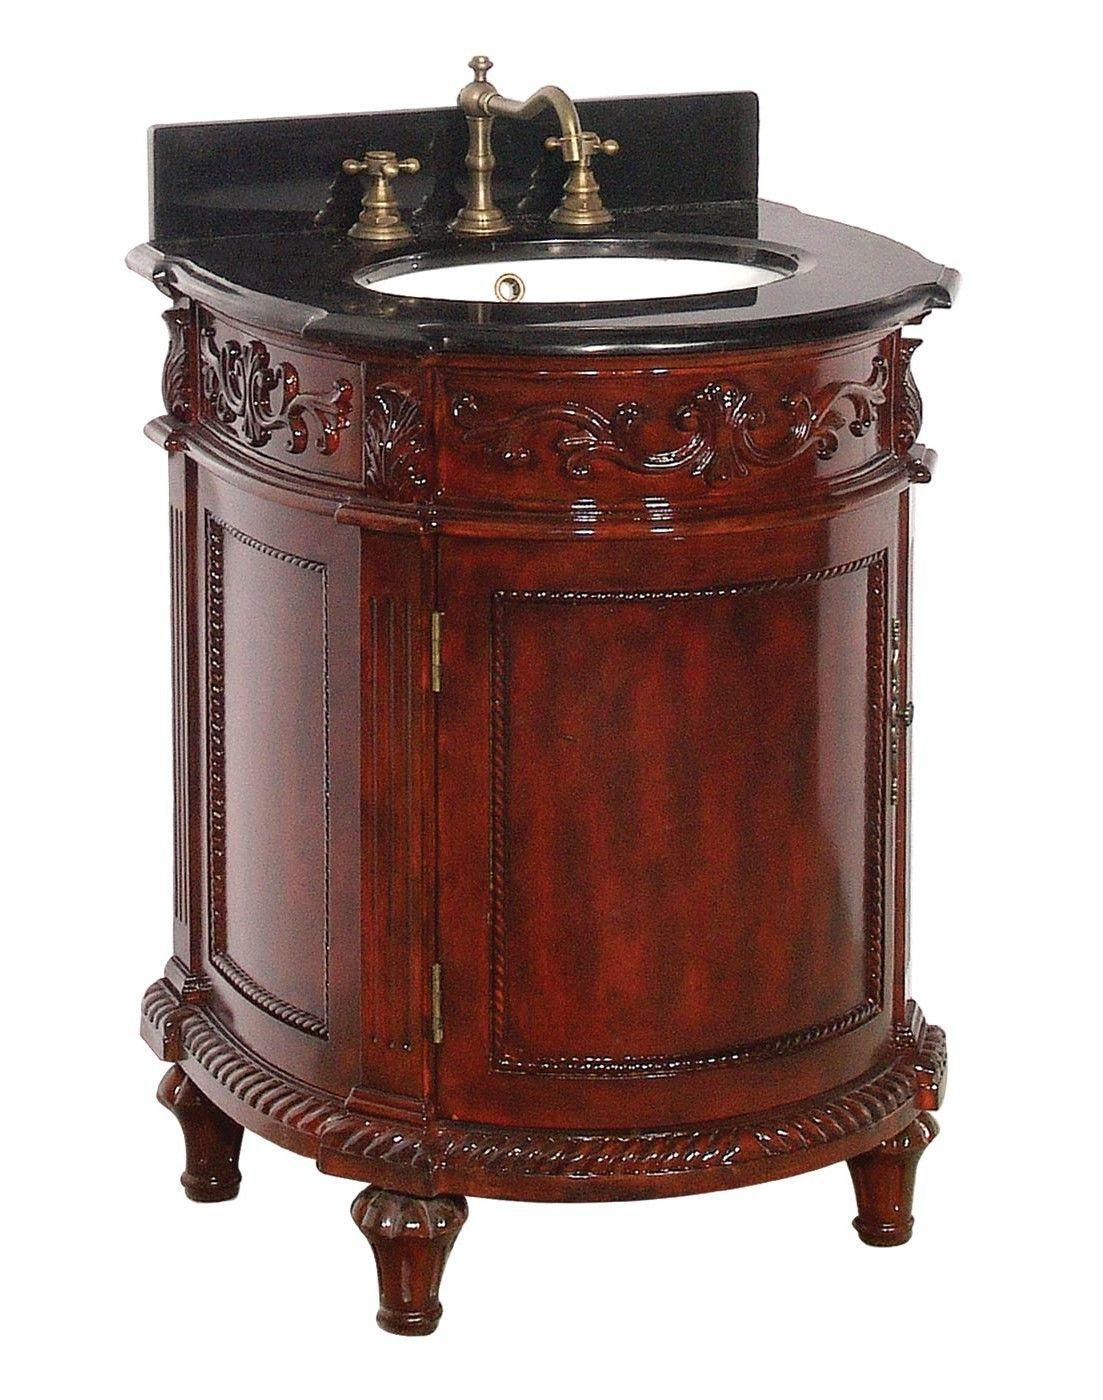 vintage bathroom cabinets for storage. Vintage Bathroom Vanity Sink Cabinets The Adelina 36 Inch Antique From Storage For